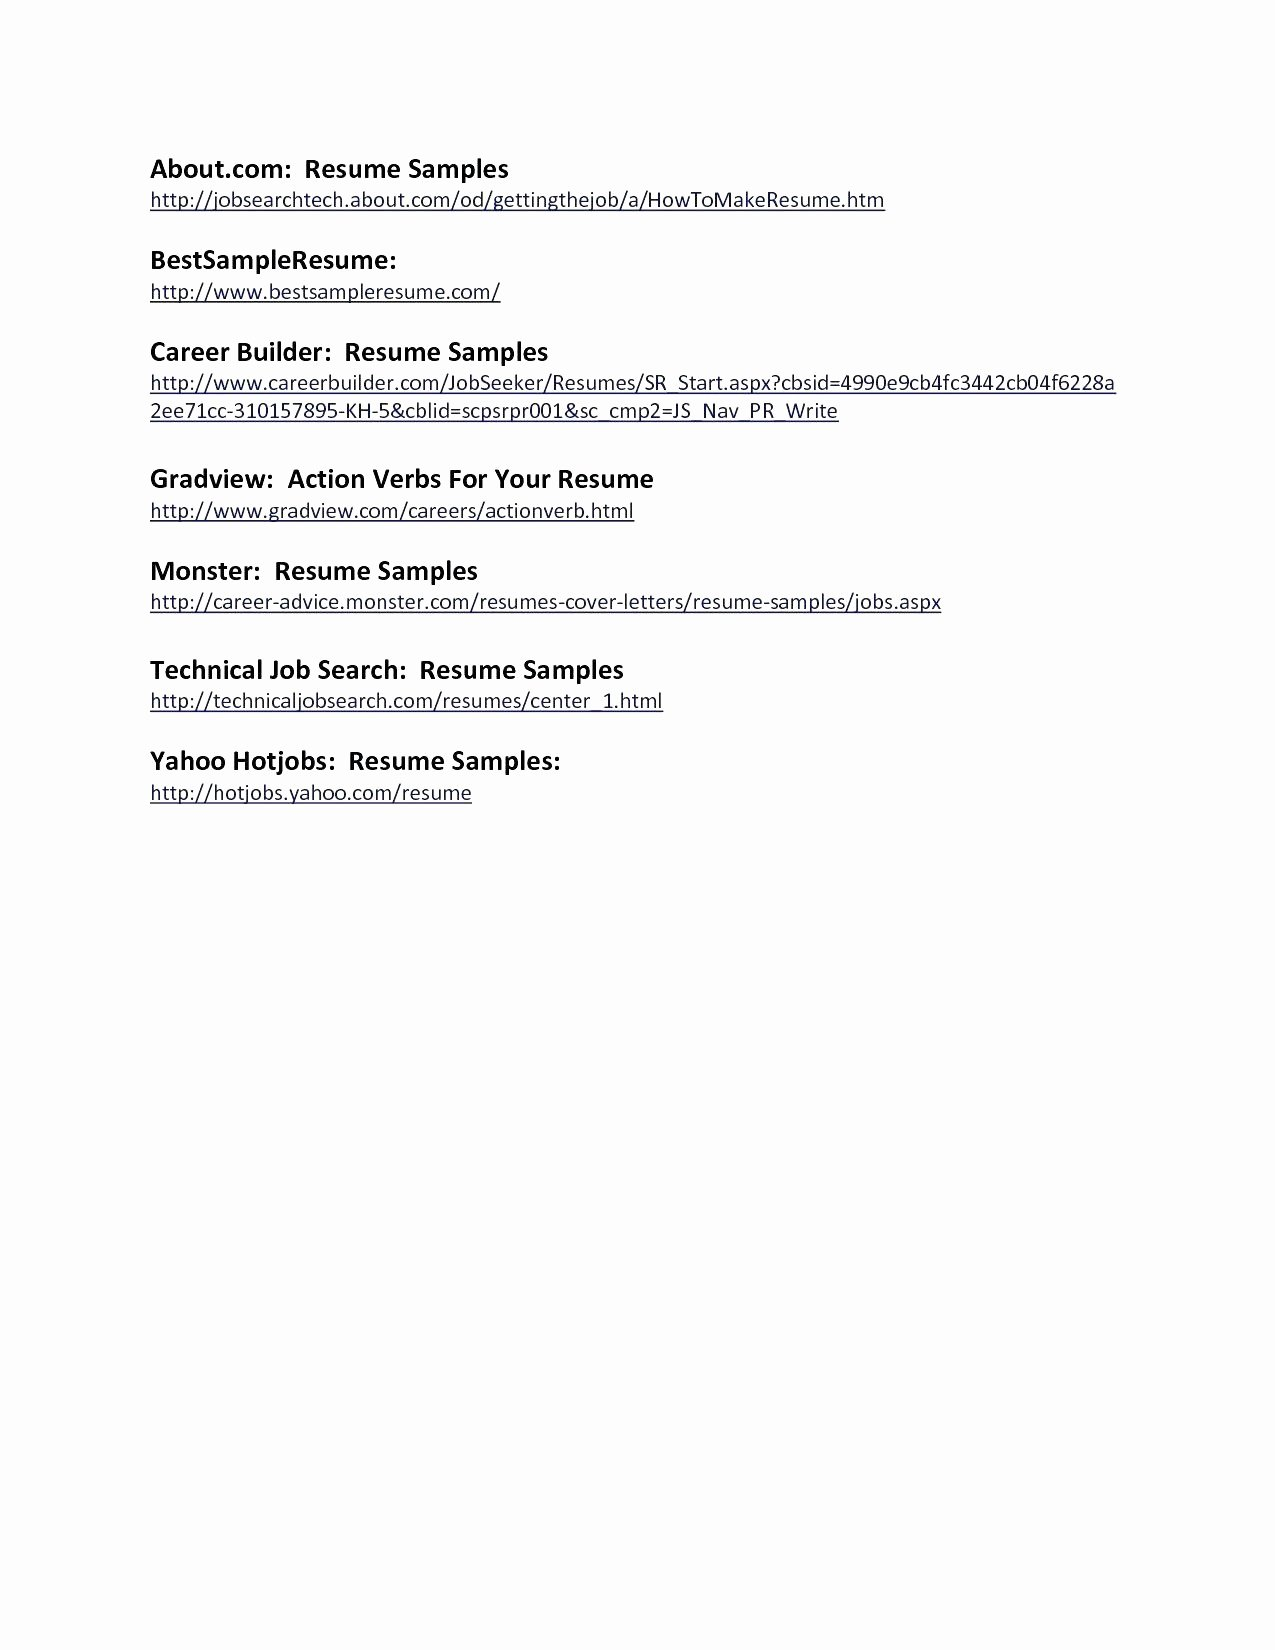 Refinance Letter Of Explanation Sample Best Of Cash Out Refinance Letter Explanation Template Collection